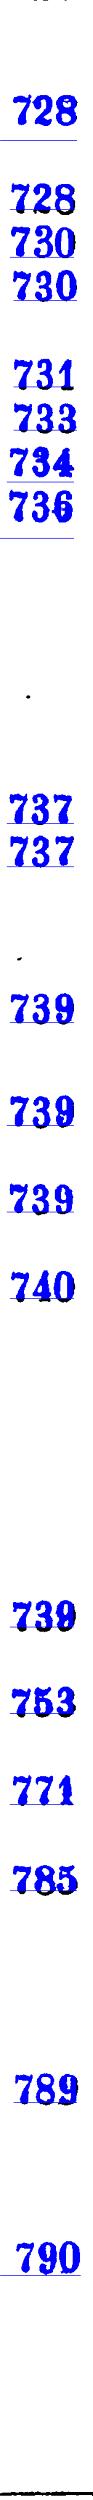 [ocr errors][ocr errors][ocr errors][ocr errors][ocr errors][ocr errors][ocr errors][ocr errors]